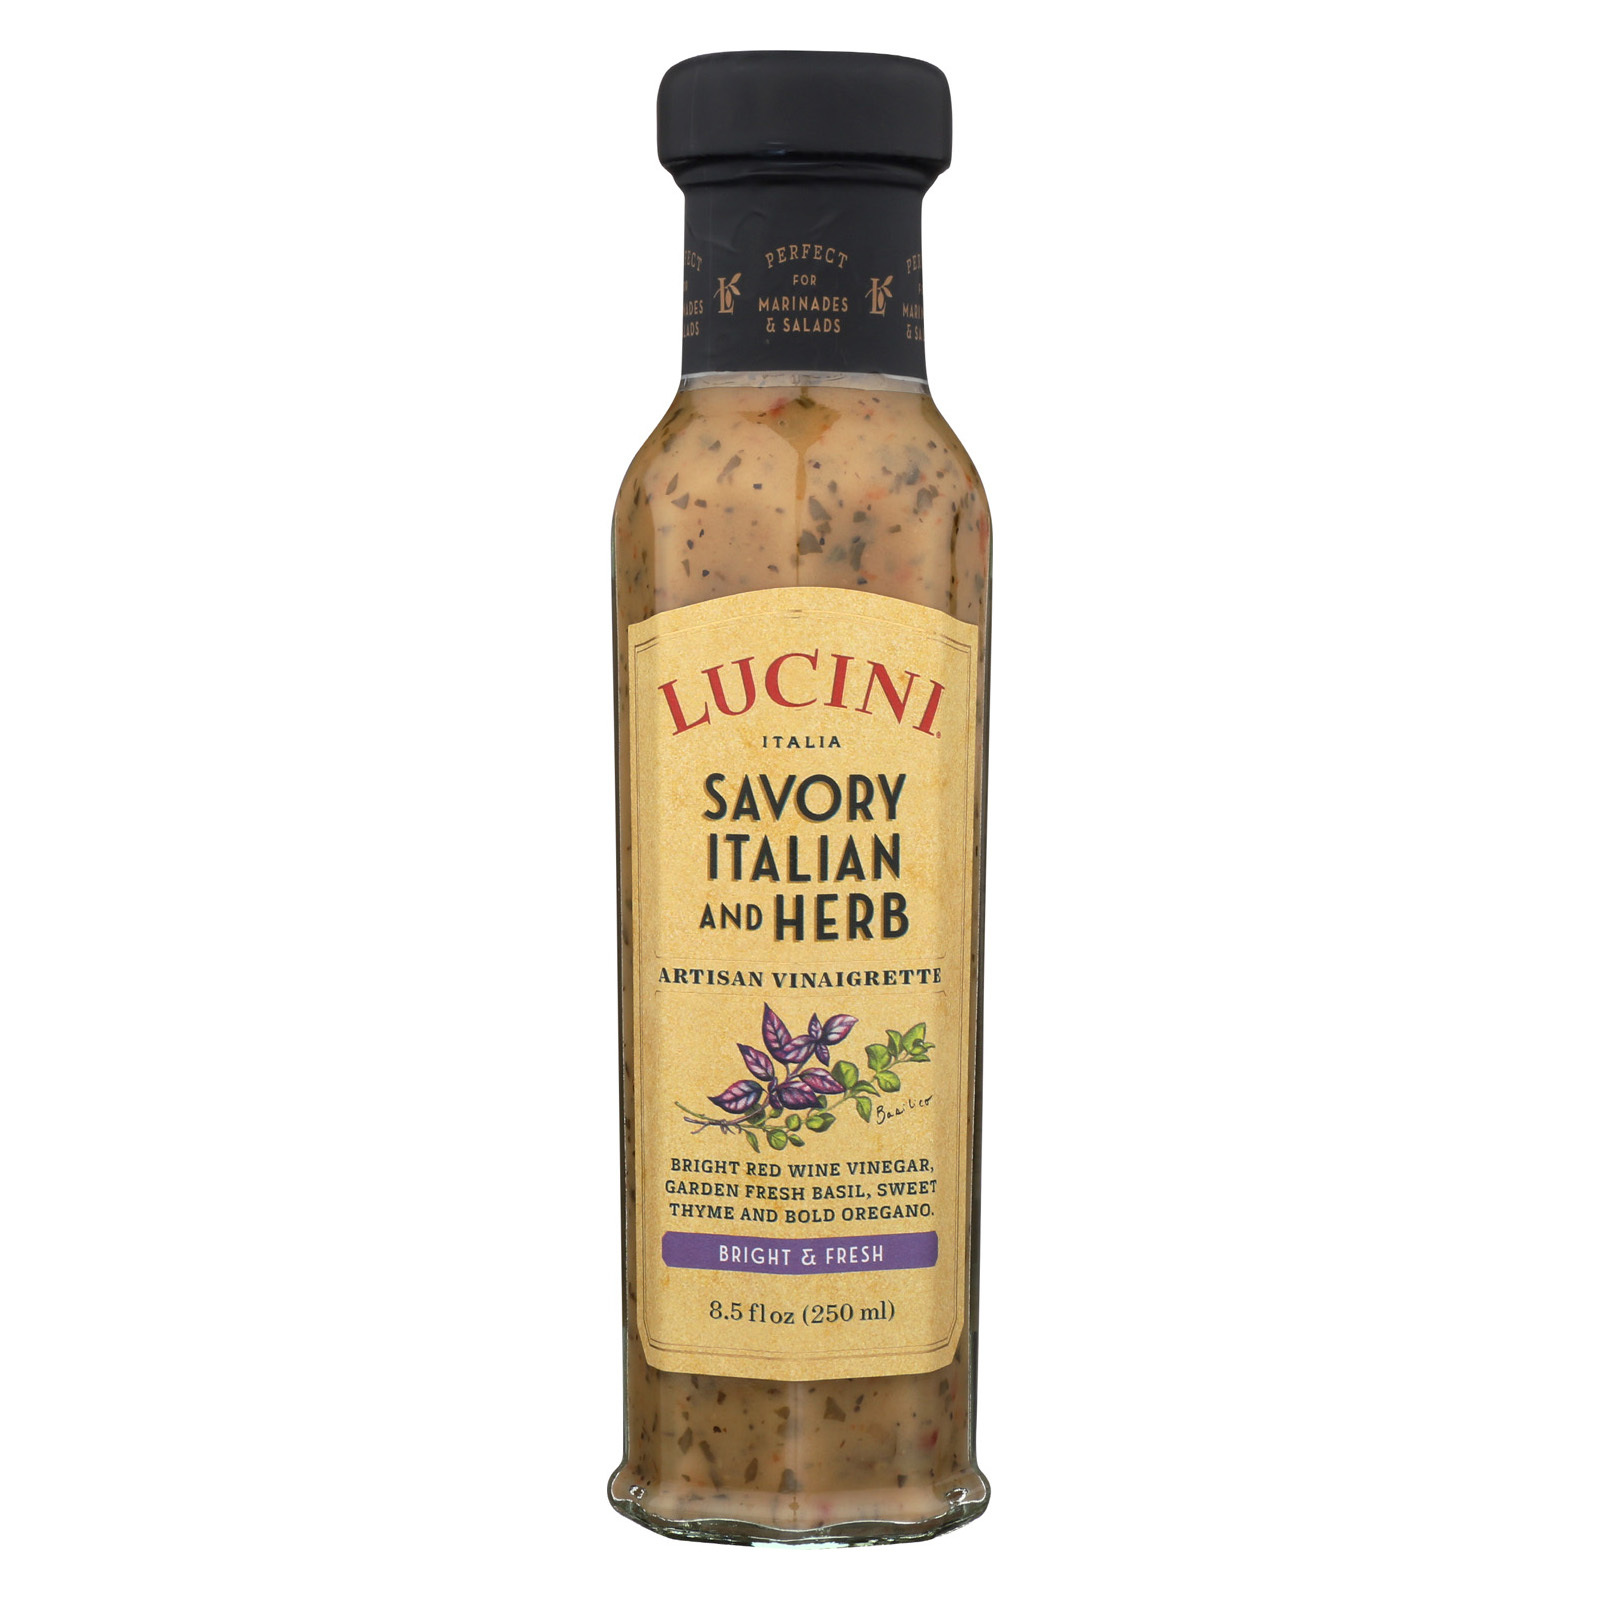 Lucini Italia Artisan Vinaigrette - Savory Italian - Case of 6 - 8.5 fl oz